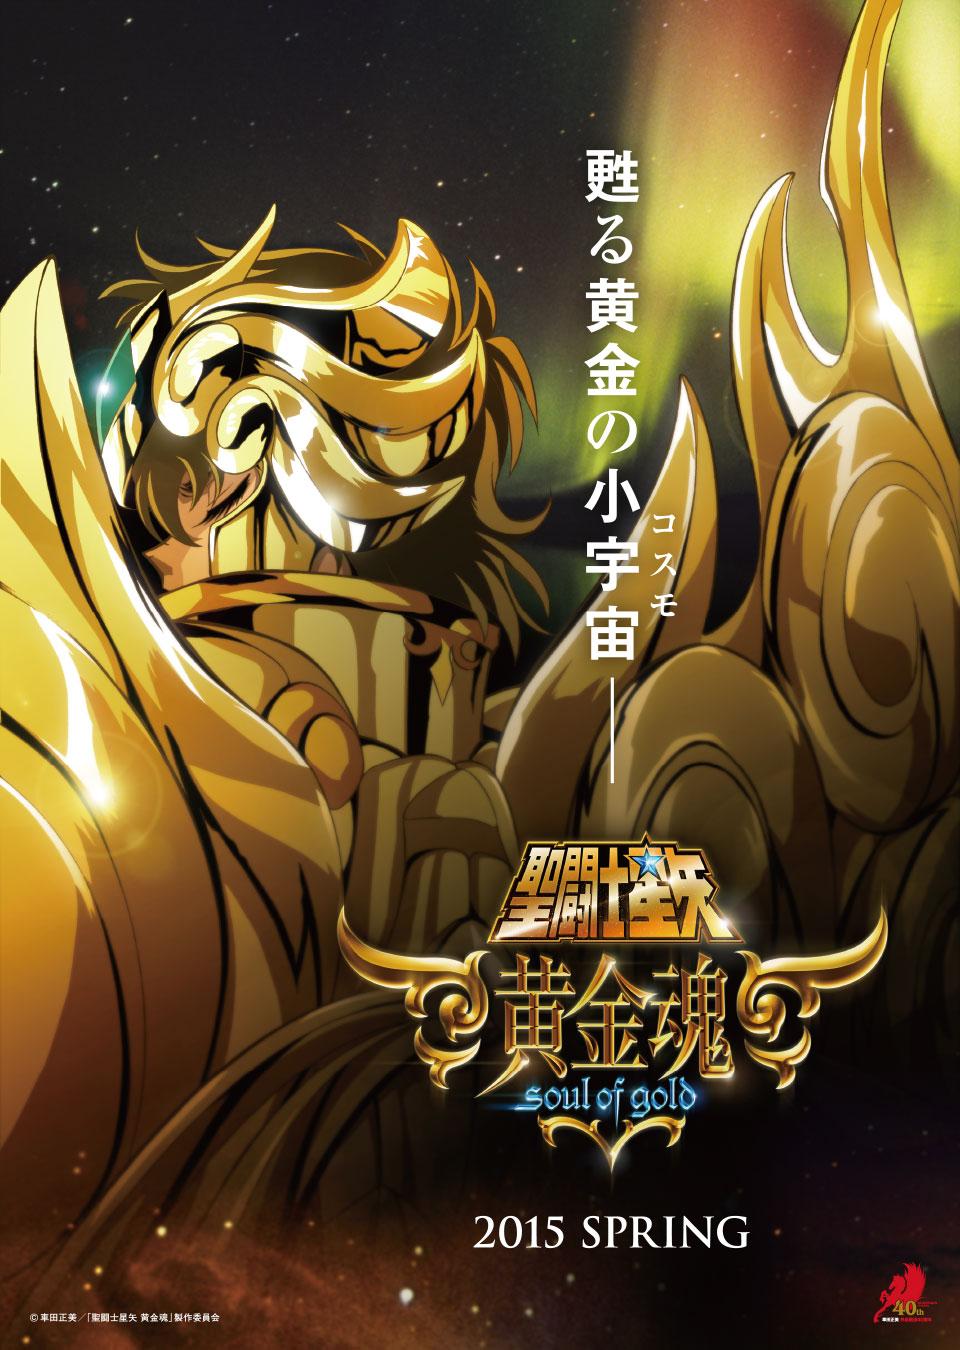 [Anime] Saint Seiya - Soul of Gold Soulof10